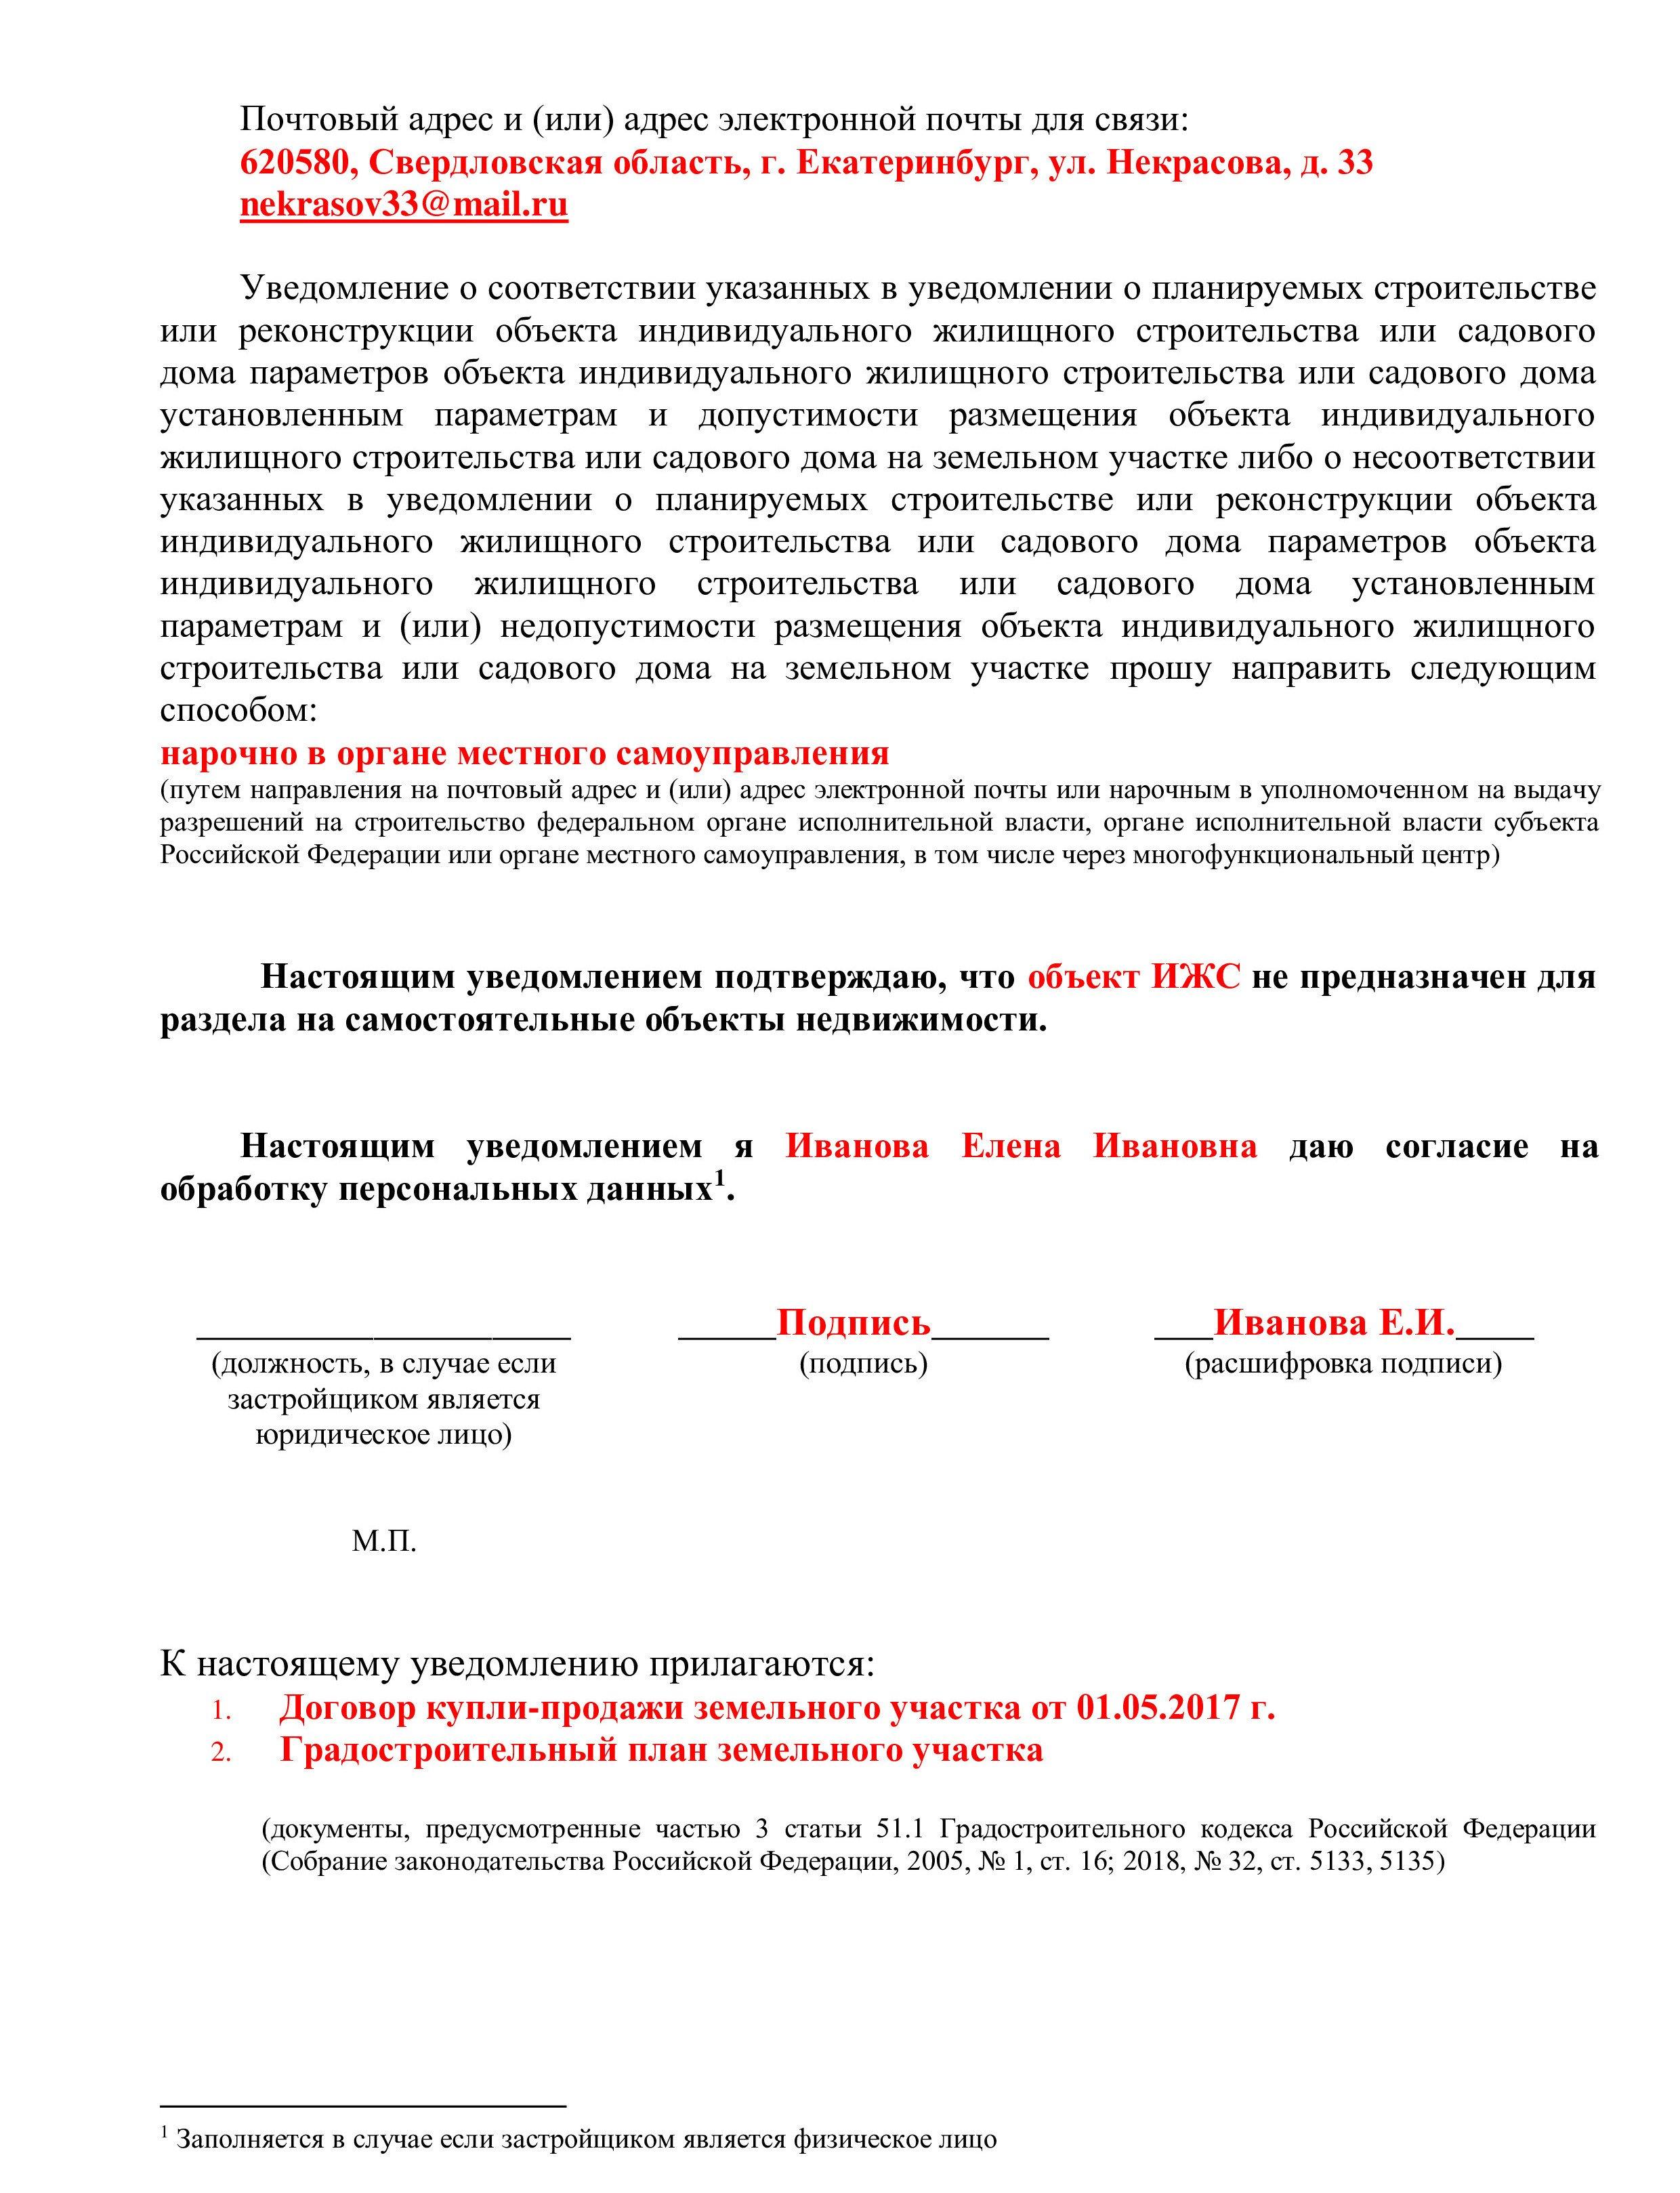 градкодекс разрешение на строительство